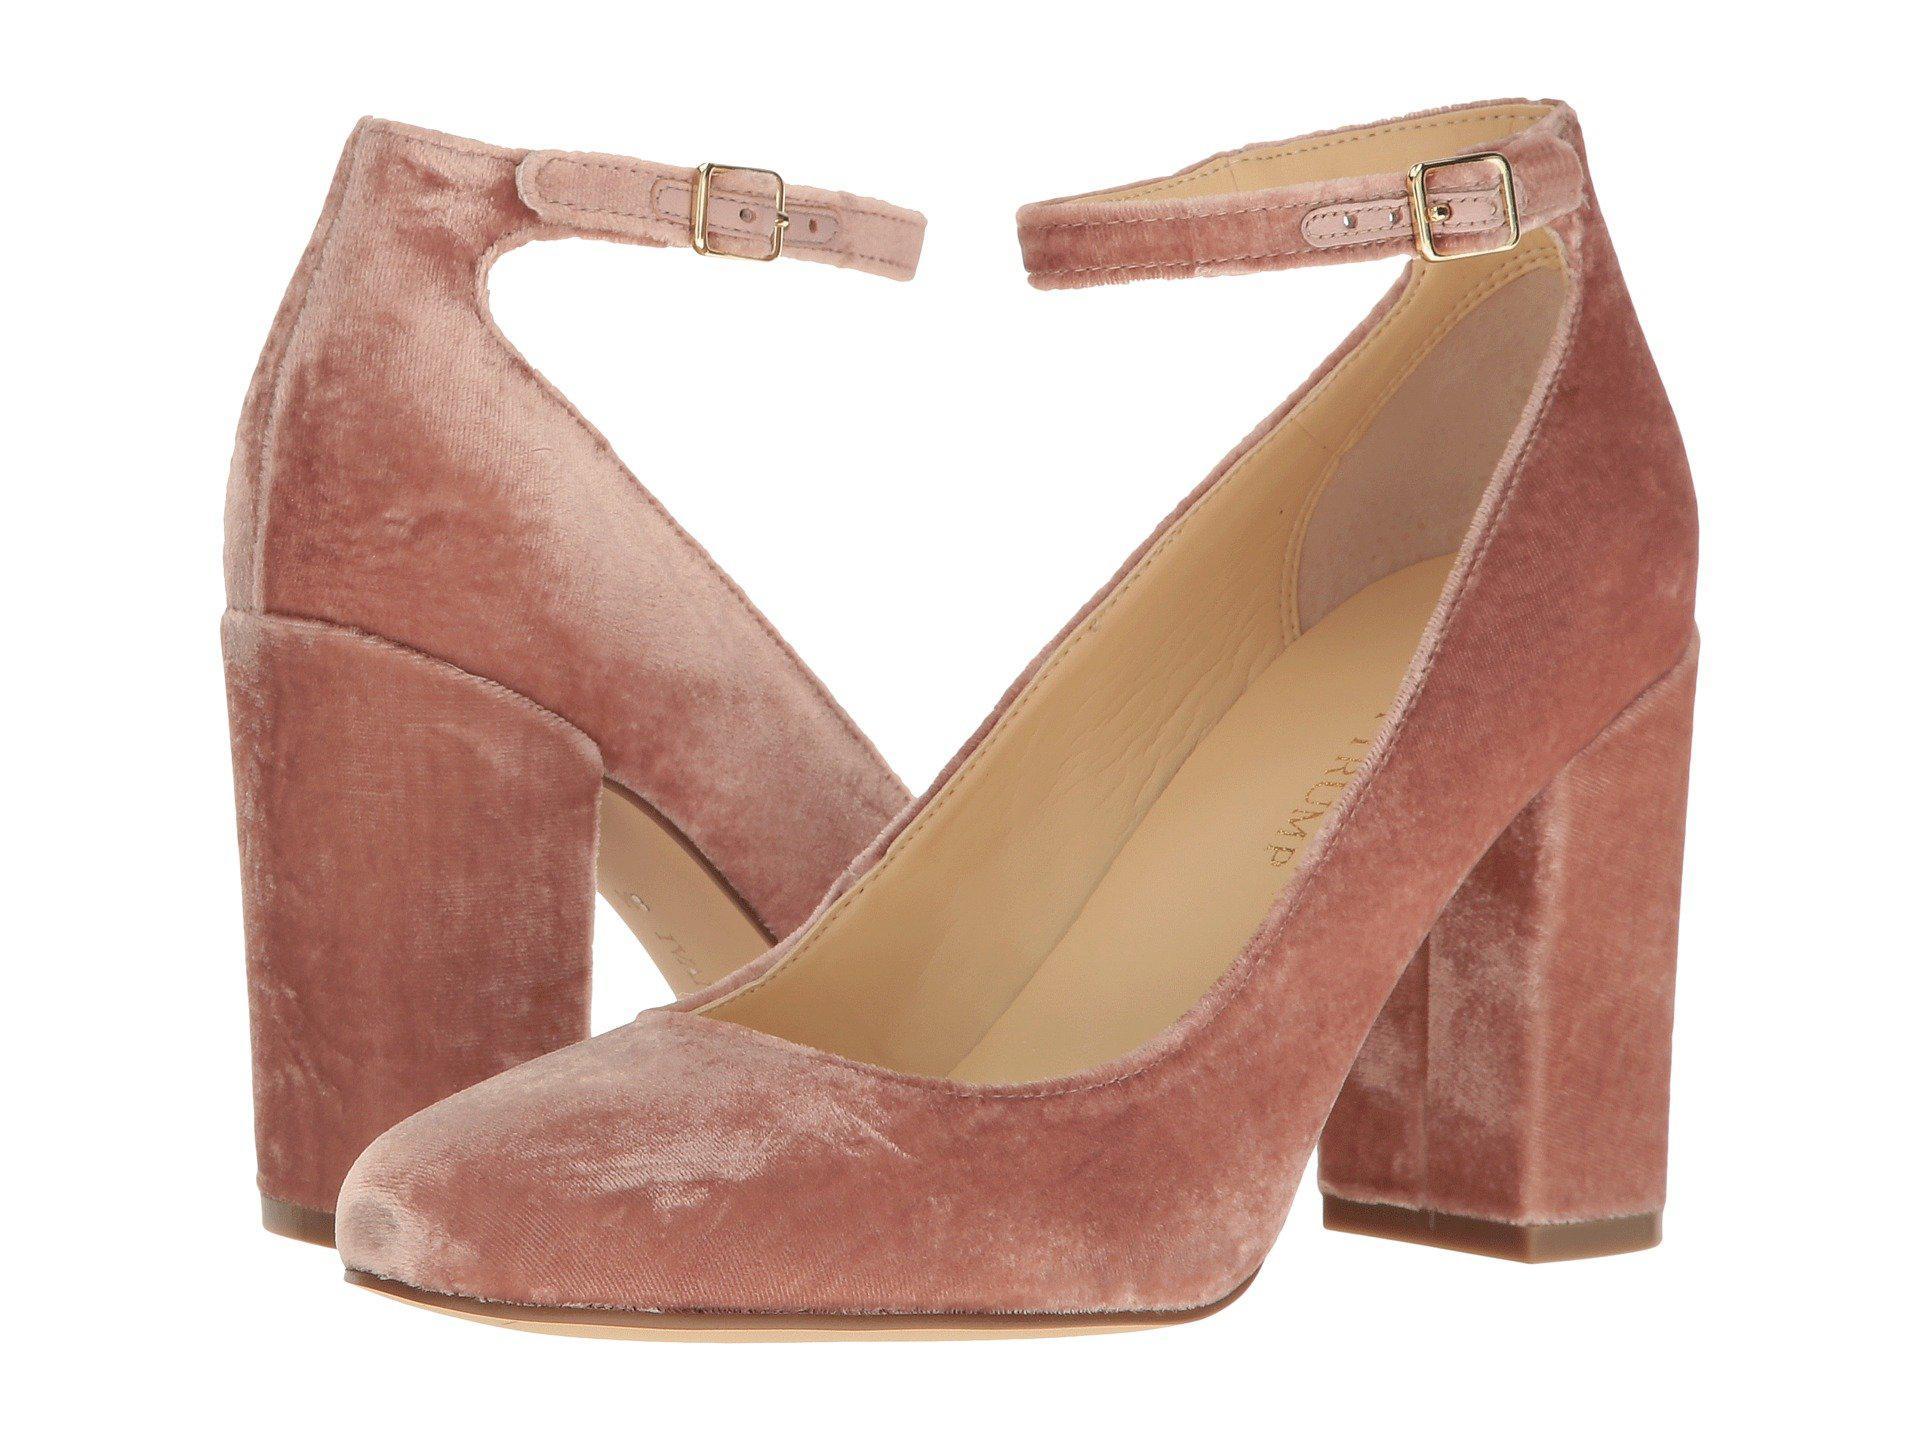 187380787a78 Lyst - Ivanka Trump Oasia 2 in Pink